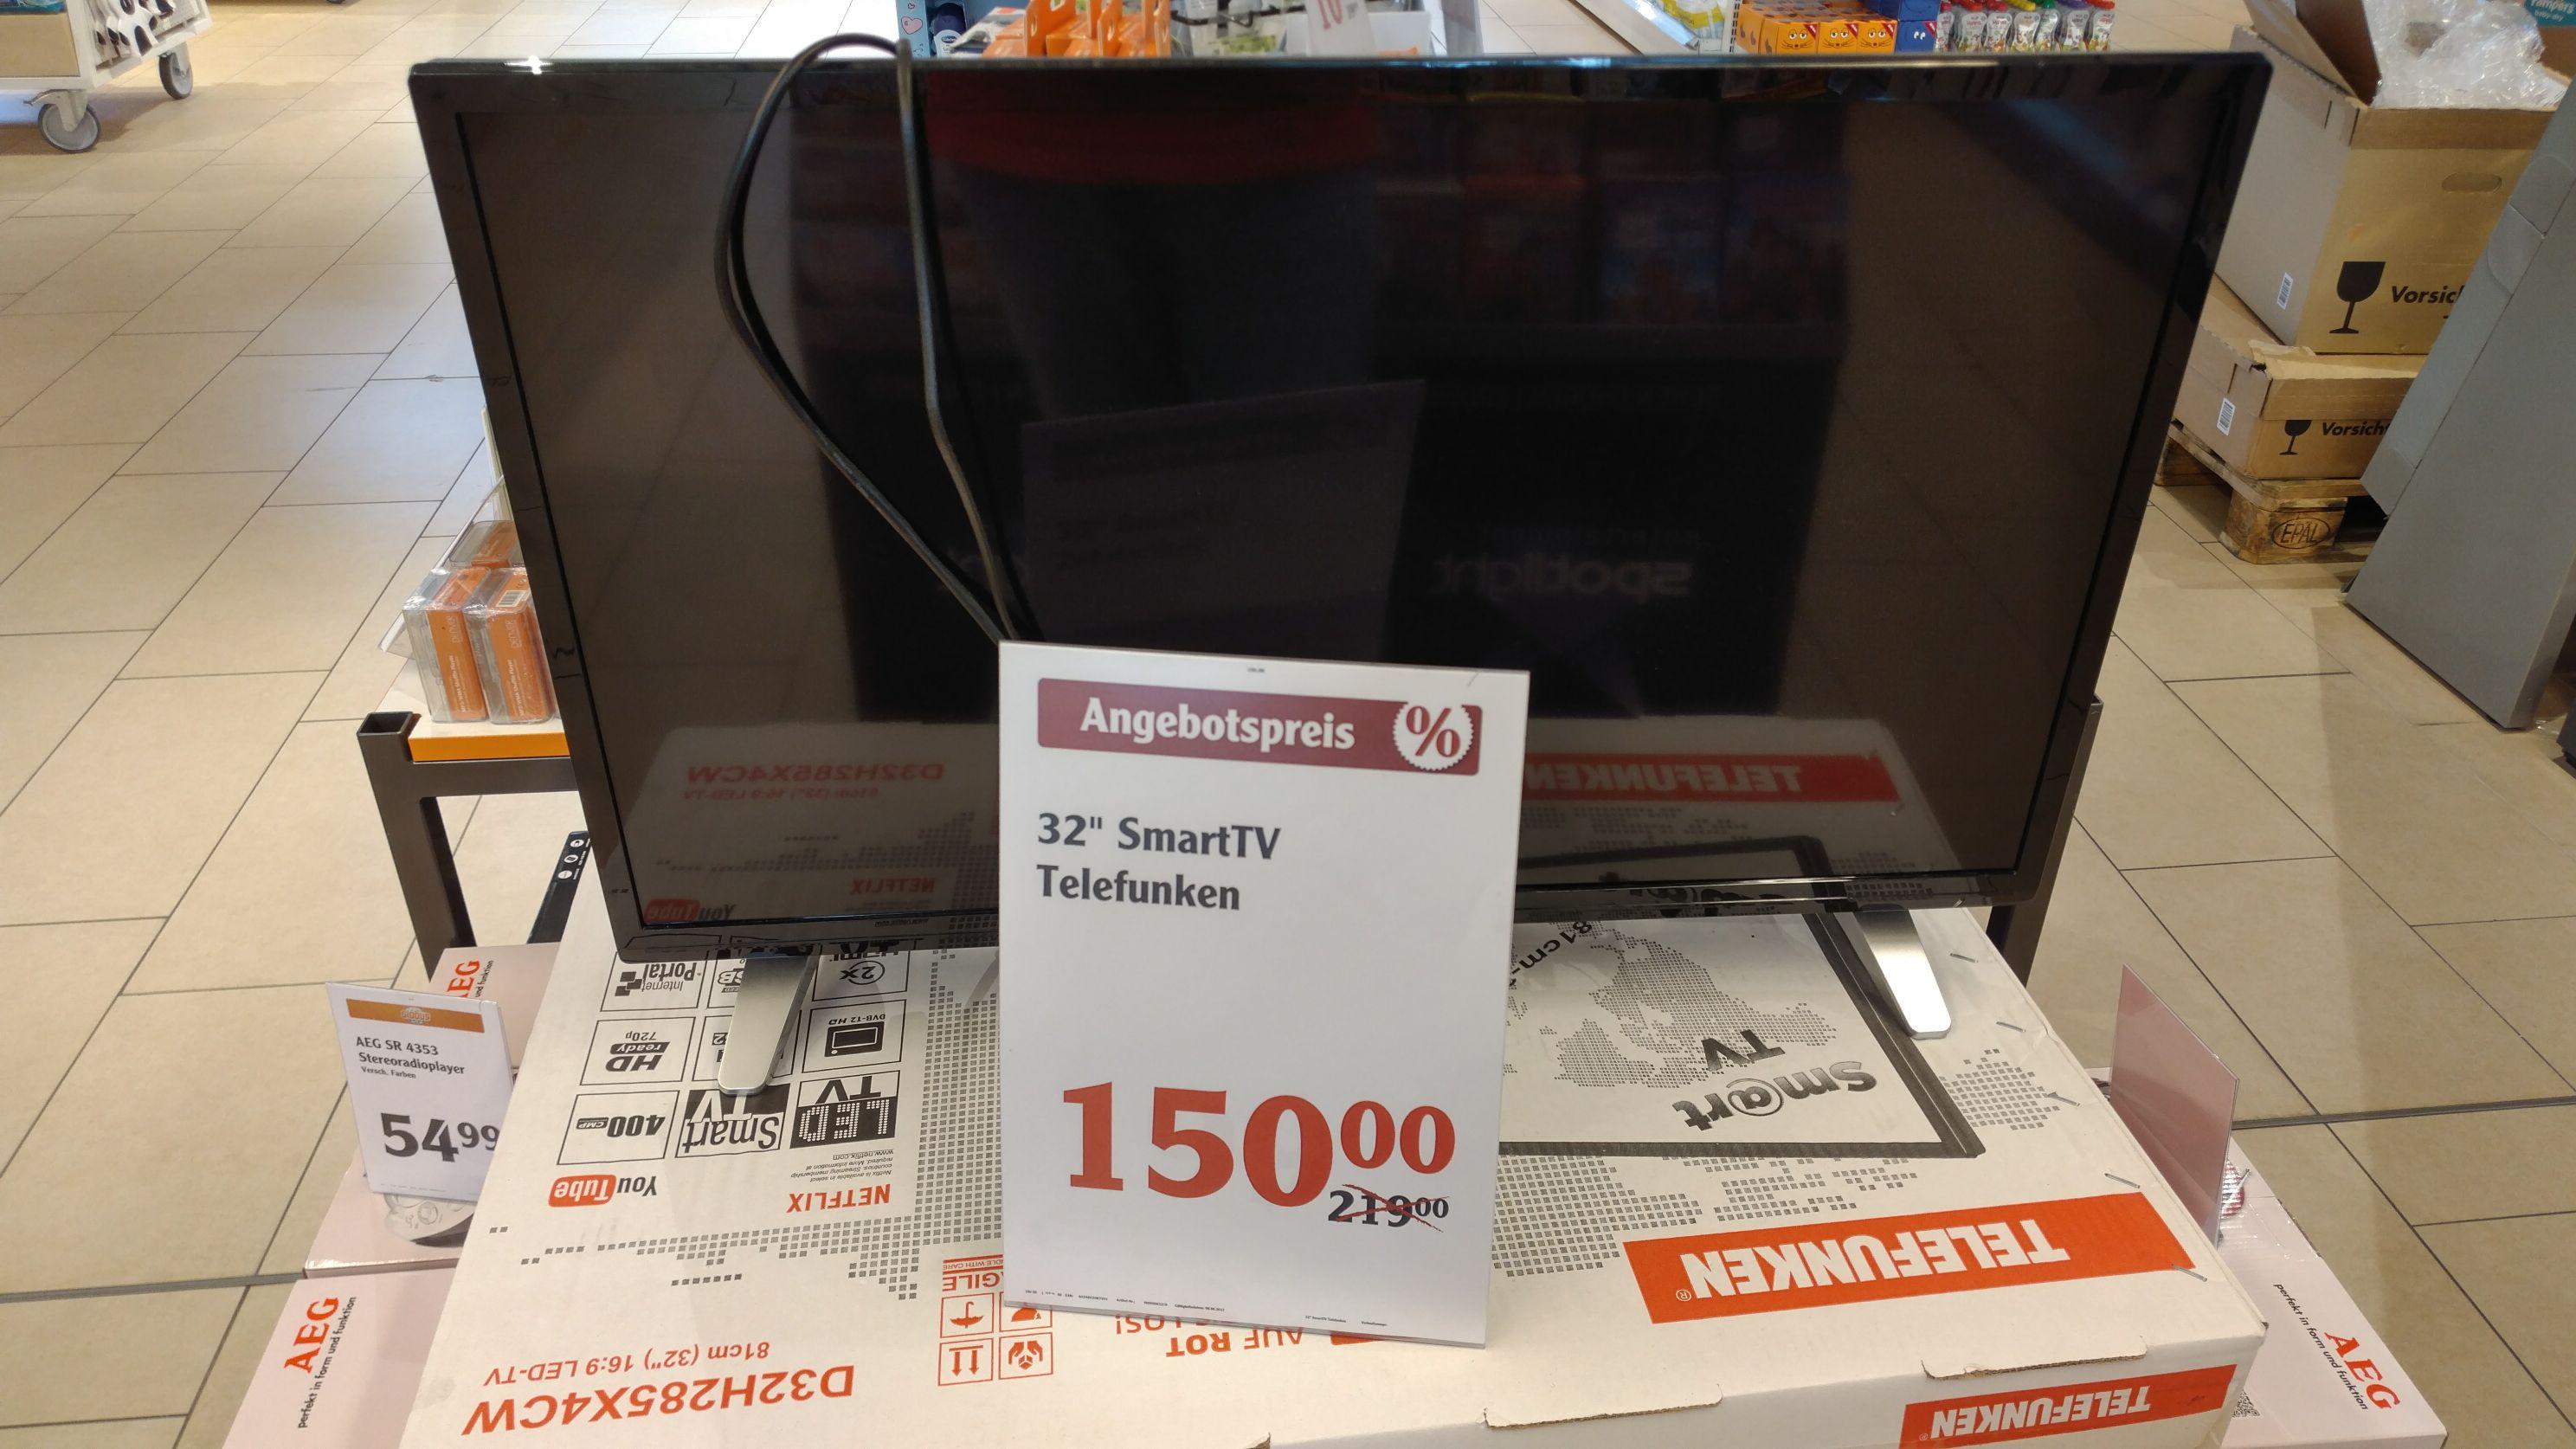 (Lokal) Globus Koblenz Telefunken D32H285X4CW 32 Zoll Smart TV